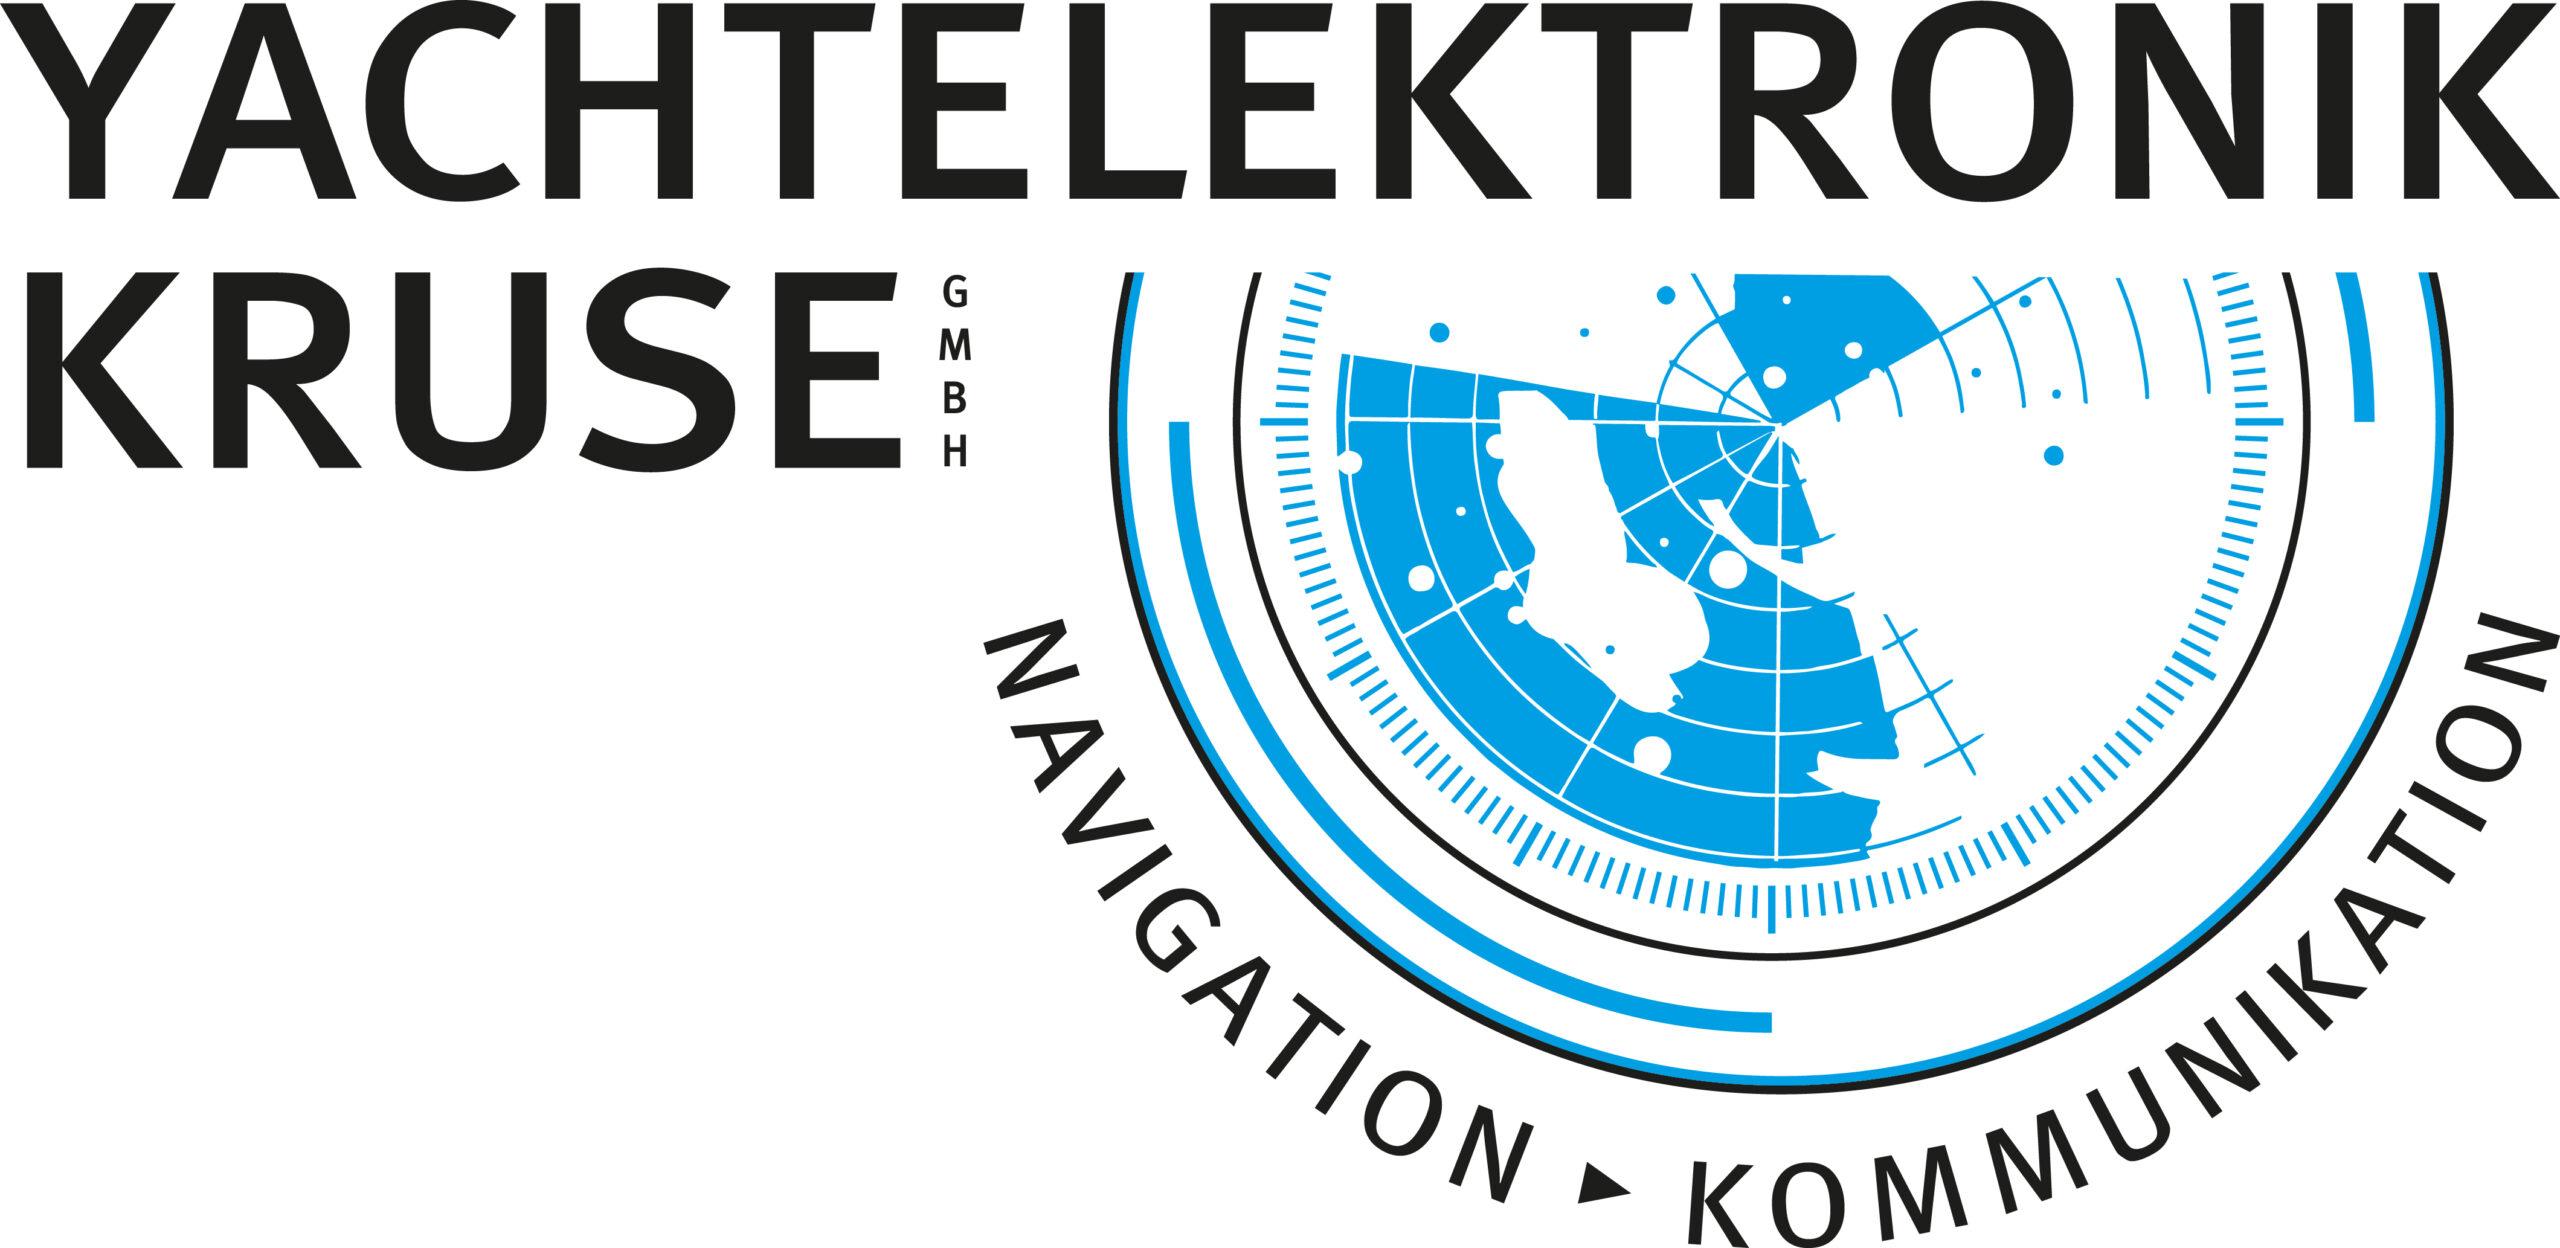 Yachtelektronik Kruse GmbH